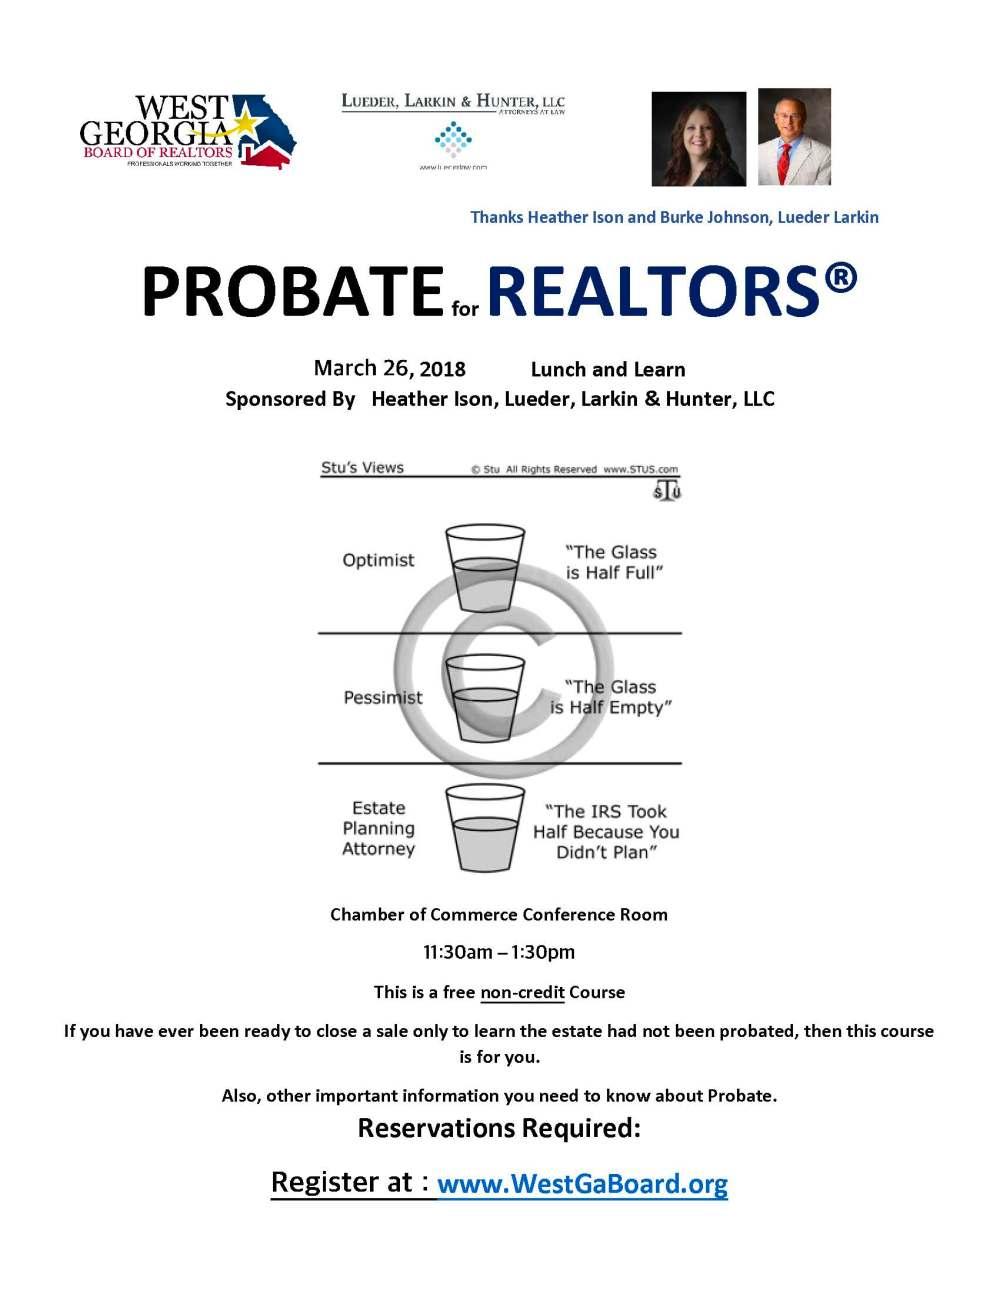 Probate for Realtors 2.26[2]